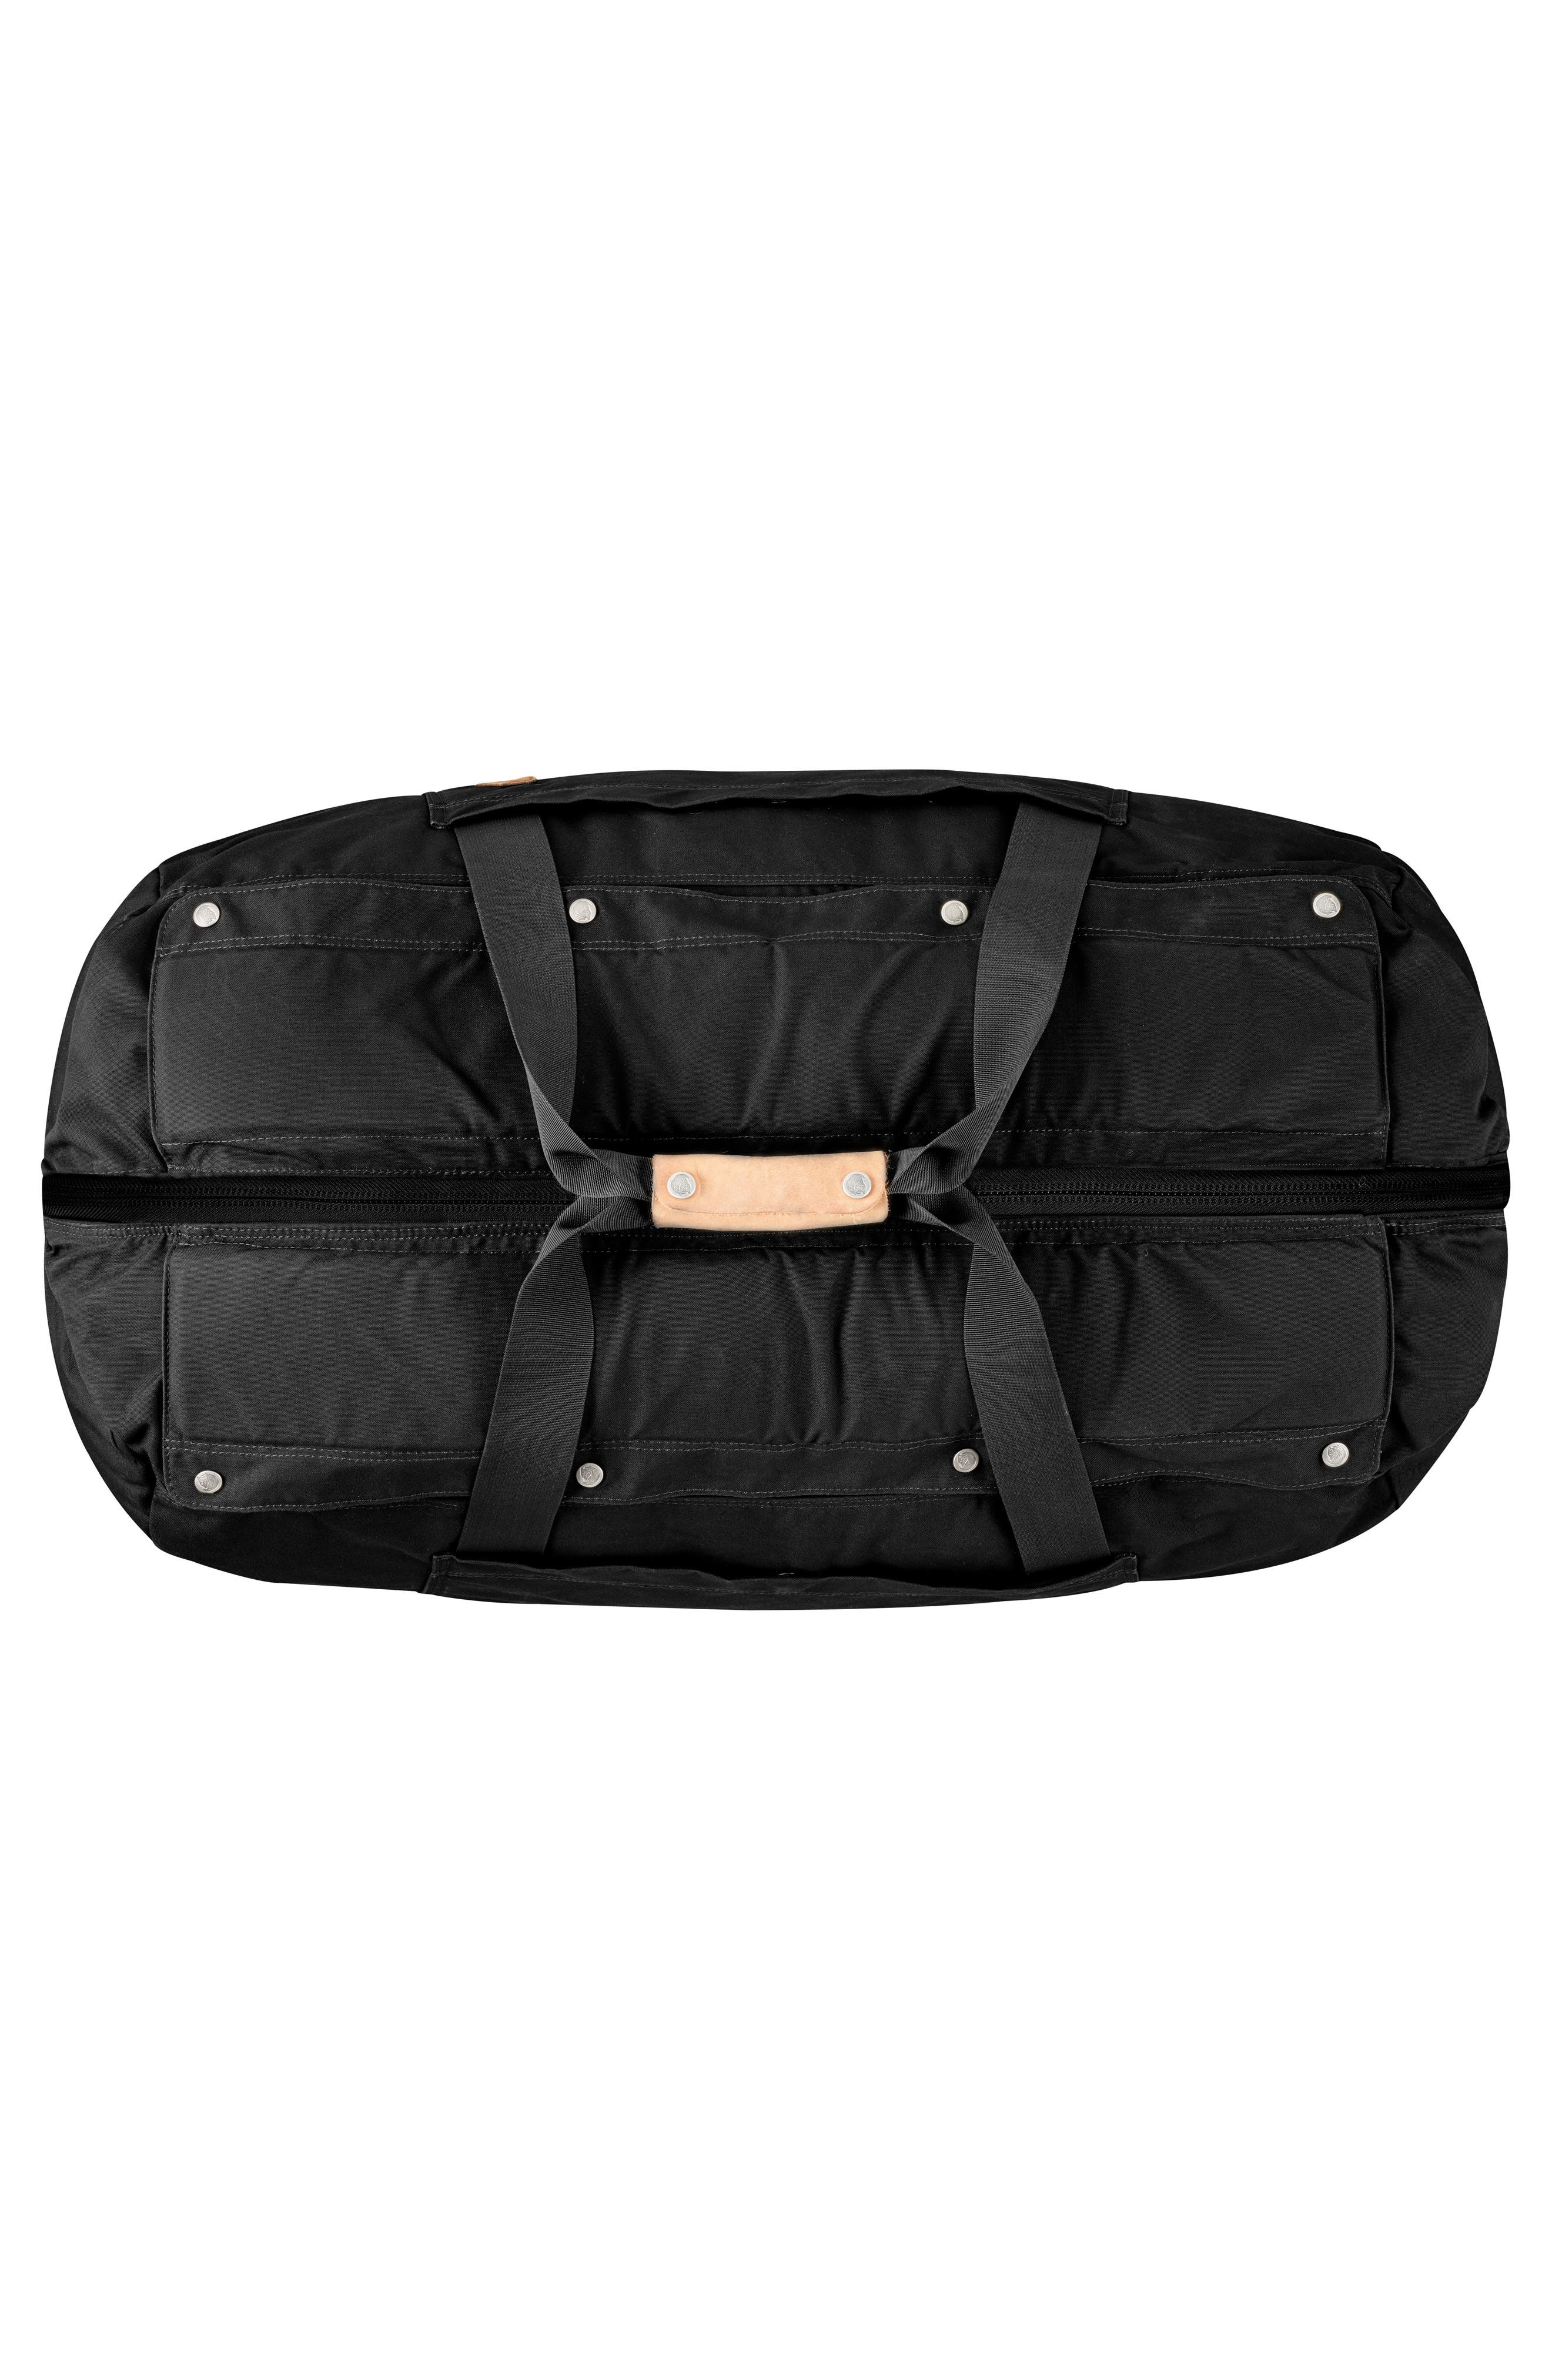 Duffel No. 6 Convertible Duffel Bag,                             Alternate thumbnail 2, color,                             Black